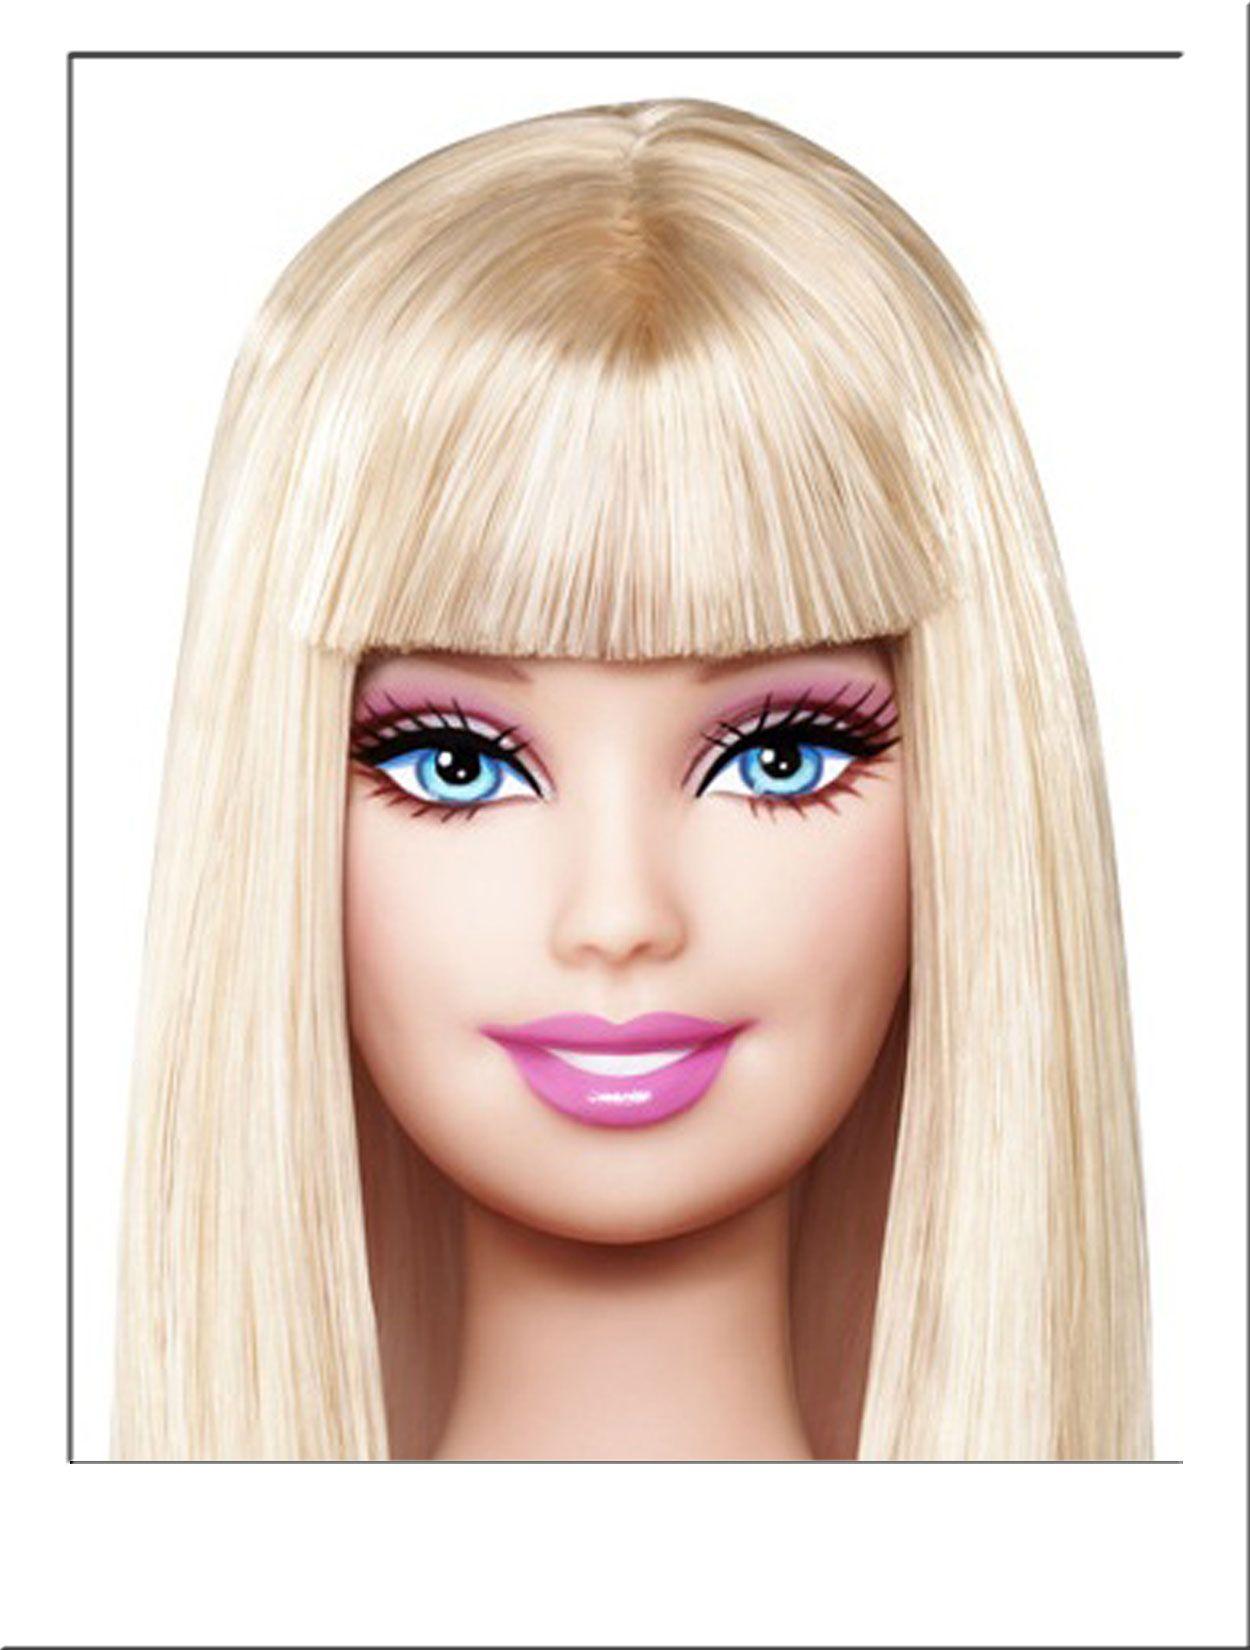 Cute hairstyles for barbie dolls - Barbie Doll Costume Wig Long Blonde Straight Fringe Hair